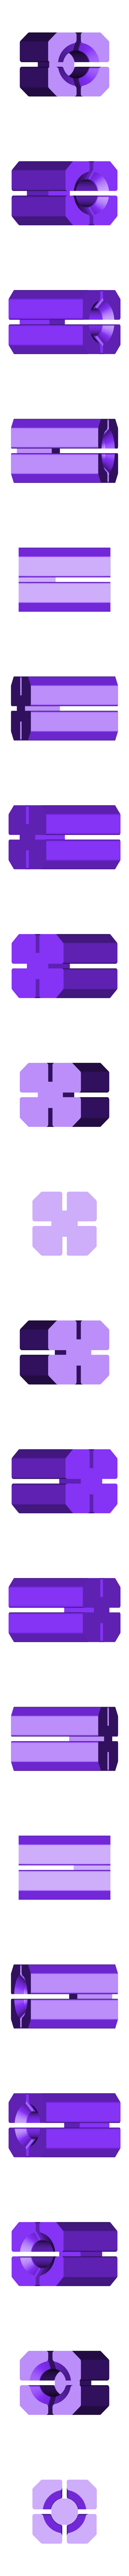 Block1.stl Télécharger fichier STL Supports d'installations d'air • Design à imprimer en 3D, mtairymd